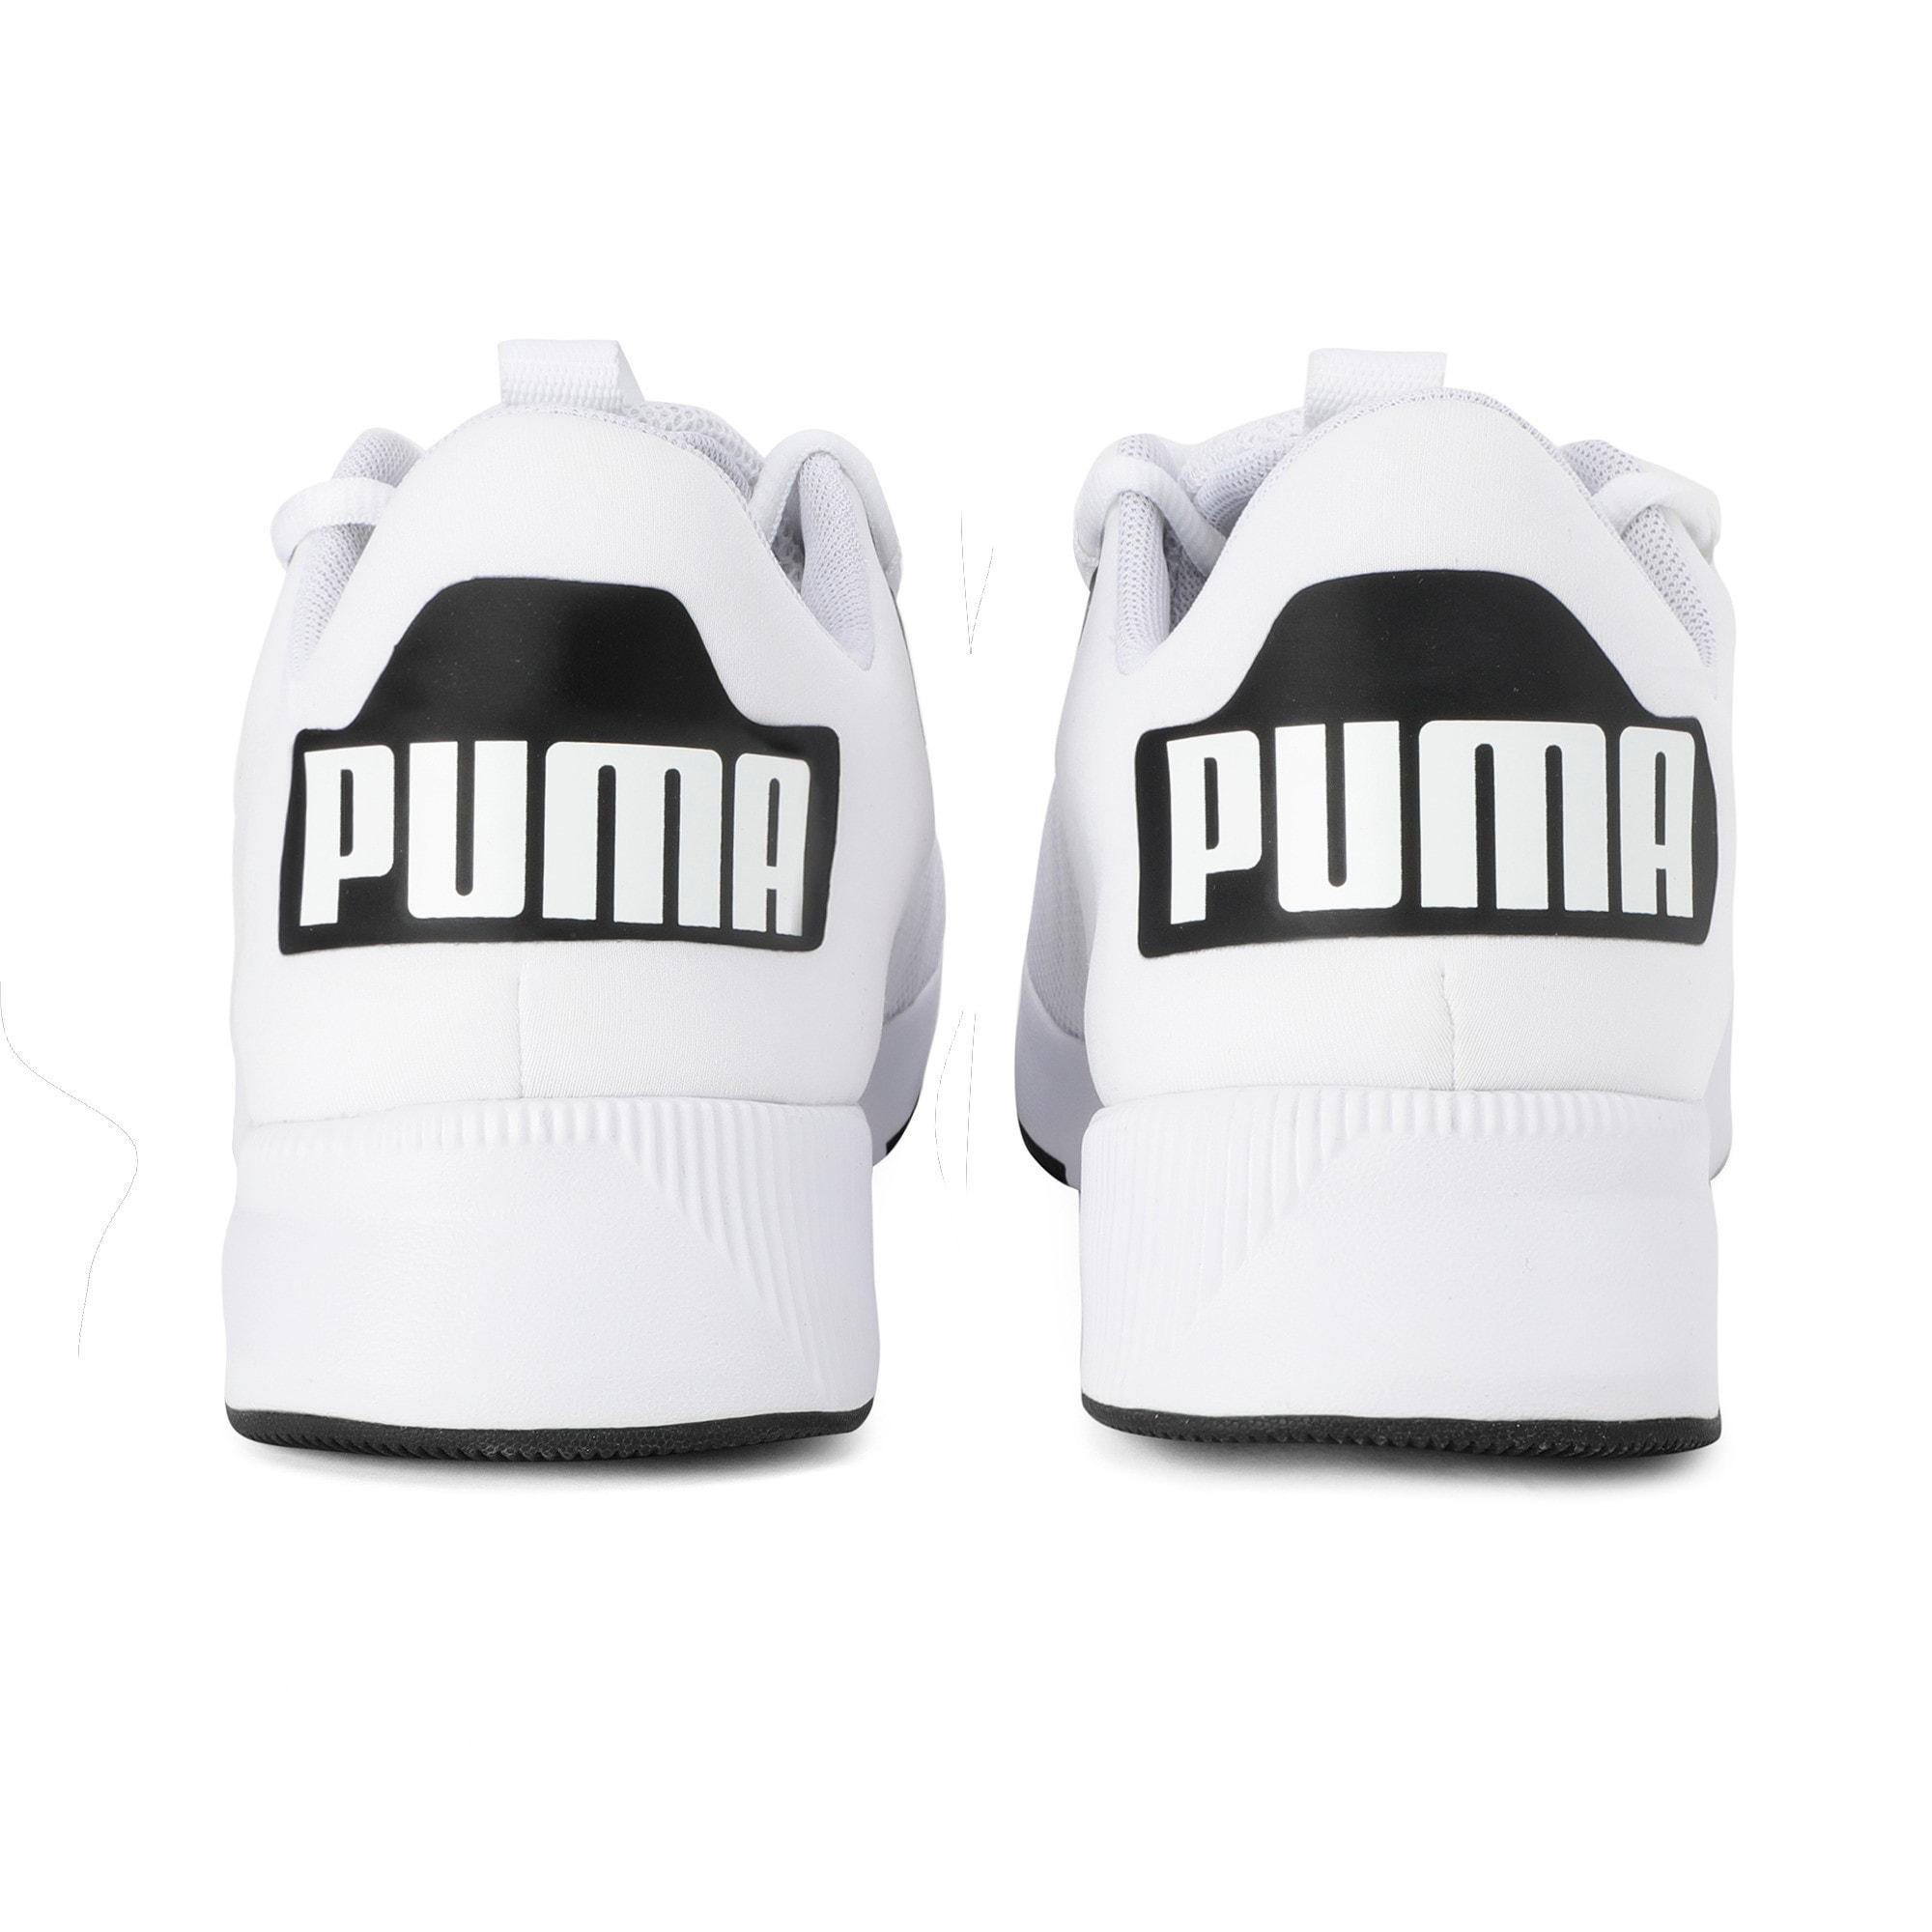 Thumbnail 3 of Flyer Modern Running Shoes, Puma White-Puma Black, medium-IND